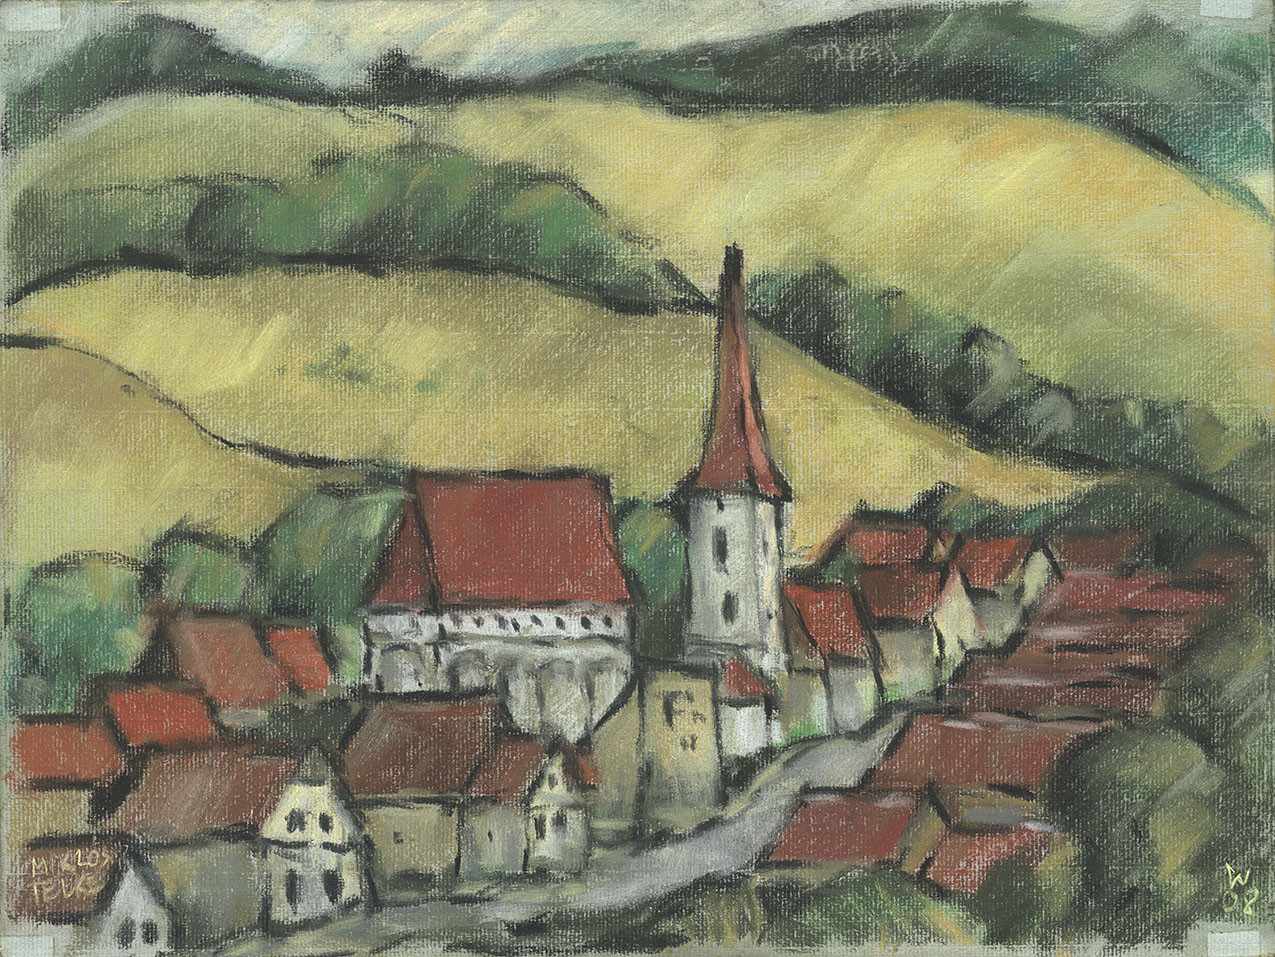 Miklóstelke-Klosdorf-Cloașterf